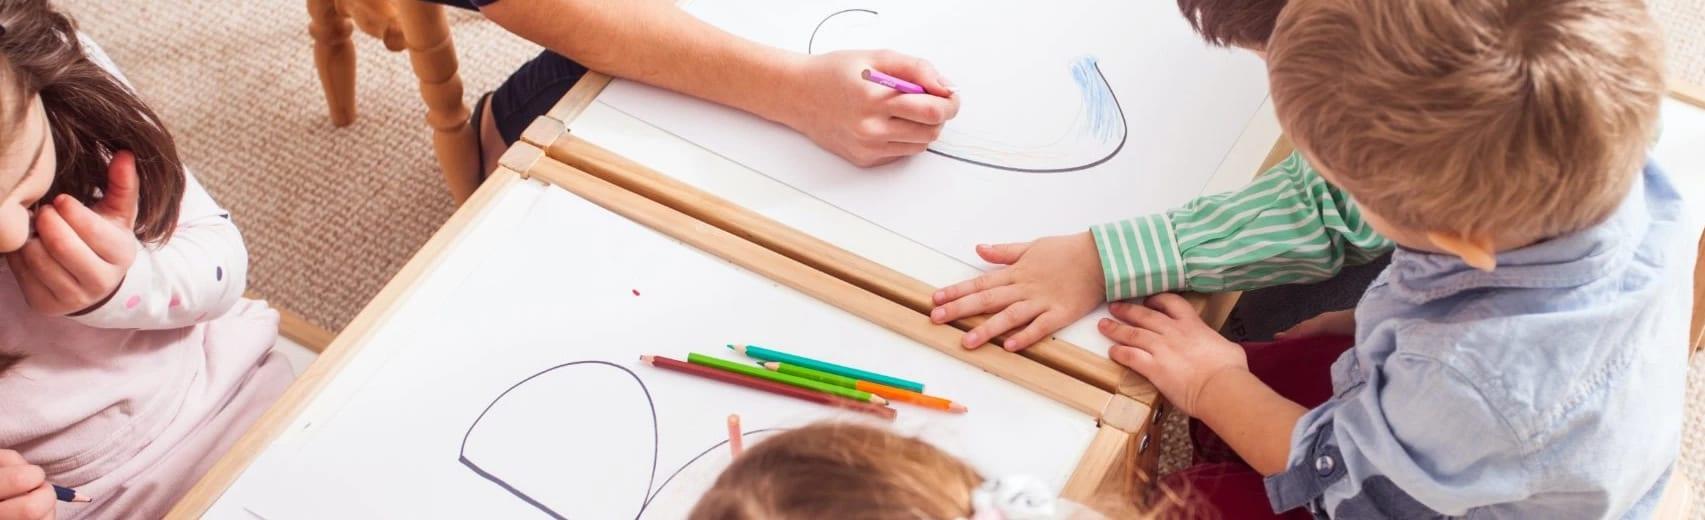 Ecole Bilingue Chardin _ Ecole Maternelle